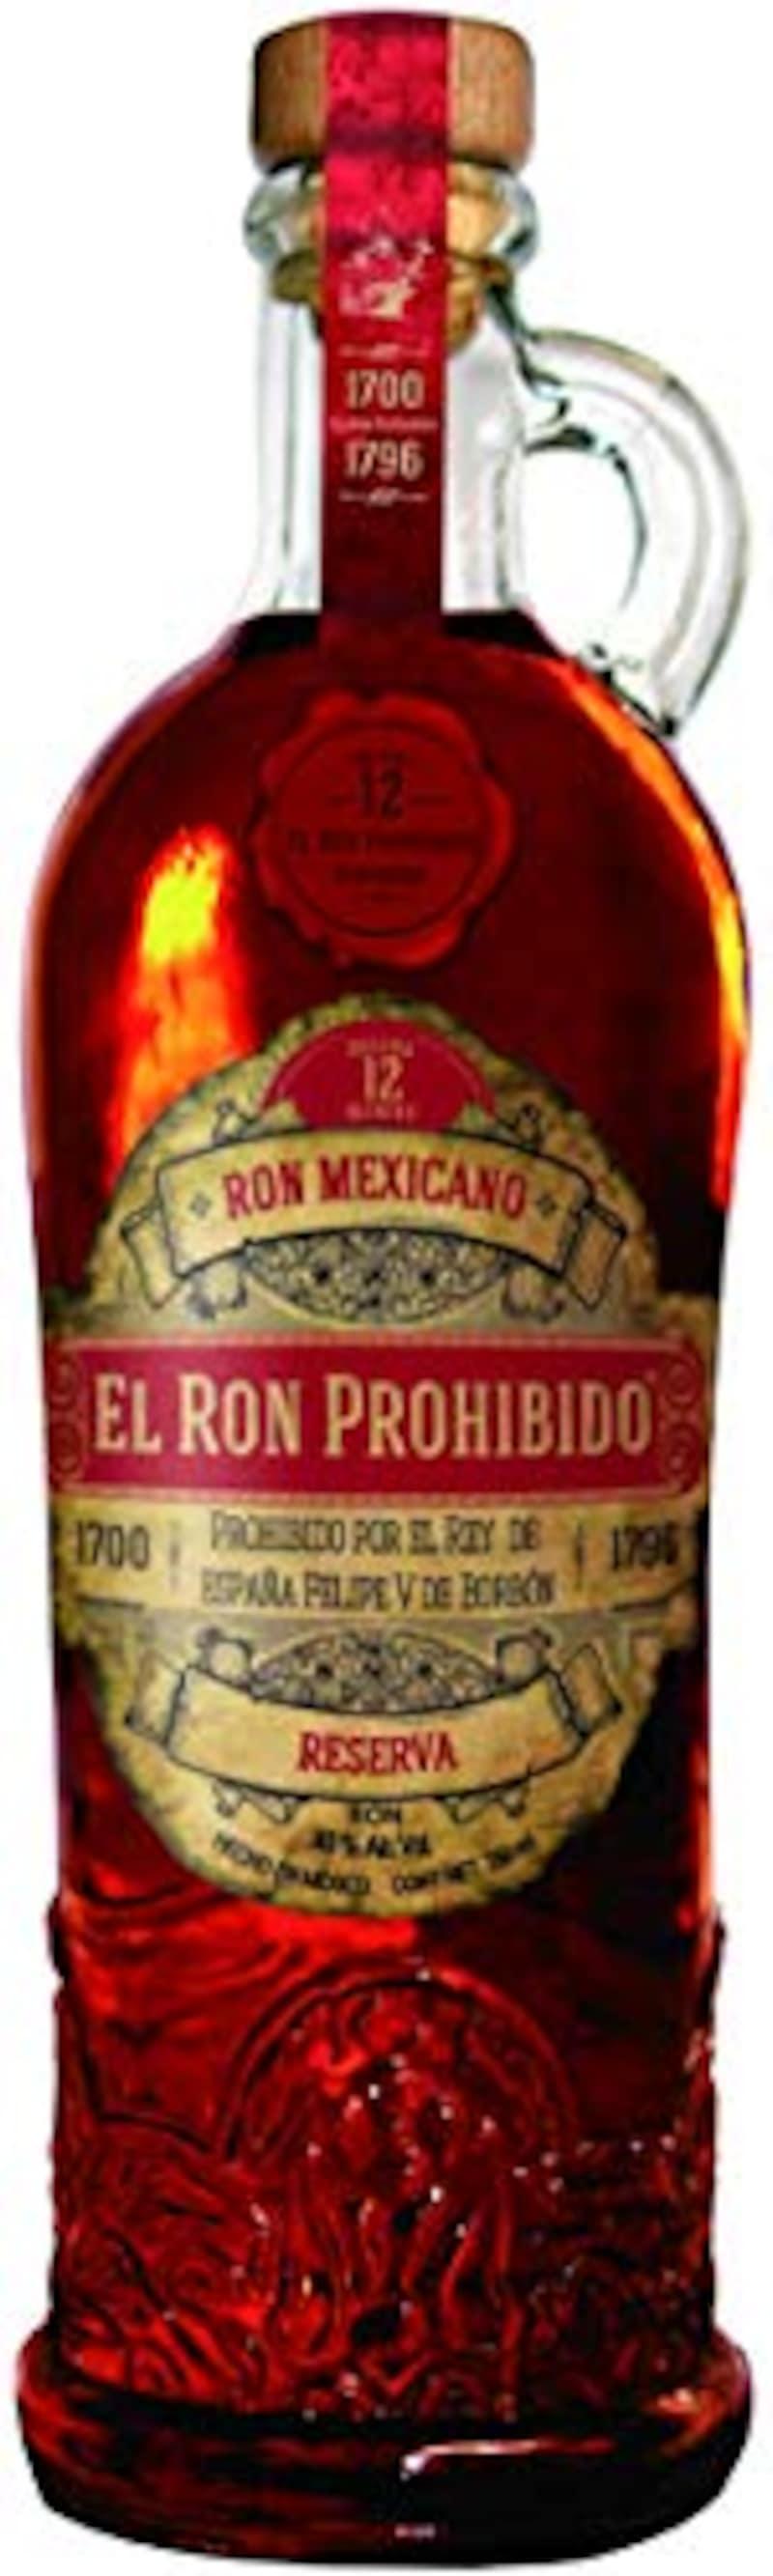 El Ron Prohibido(エル・ロン・プロイビード),エル ロン プロイビード 12年